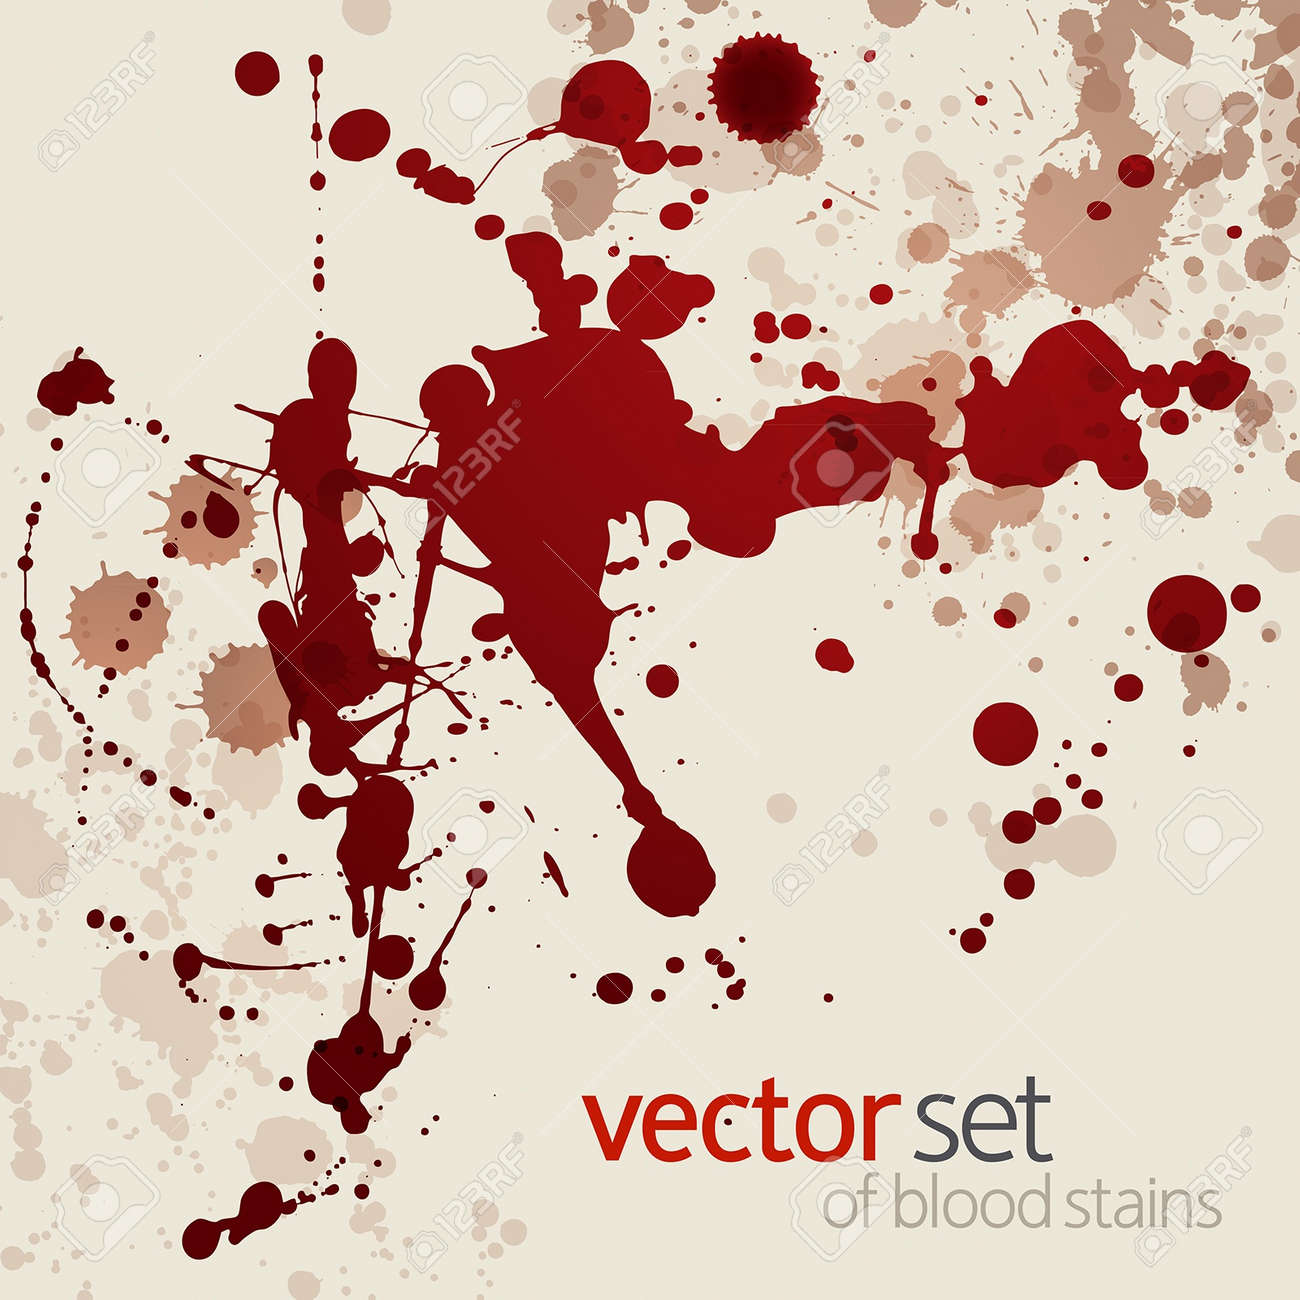 Splattered blood stains,background Stock Vector - 14792101